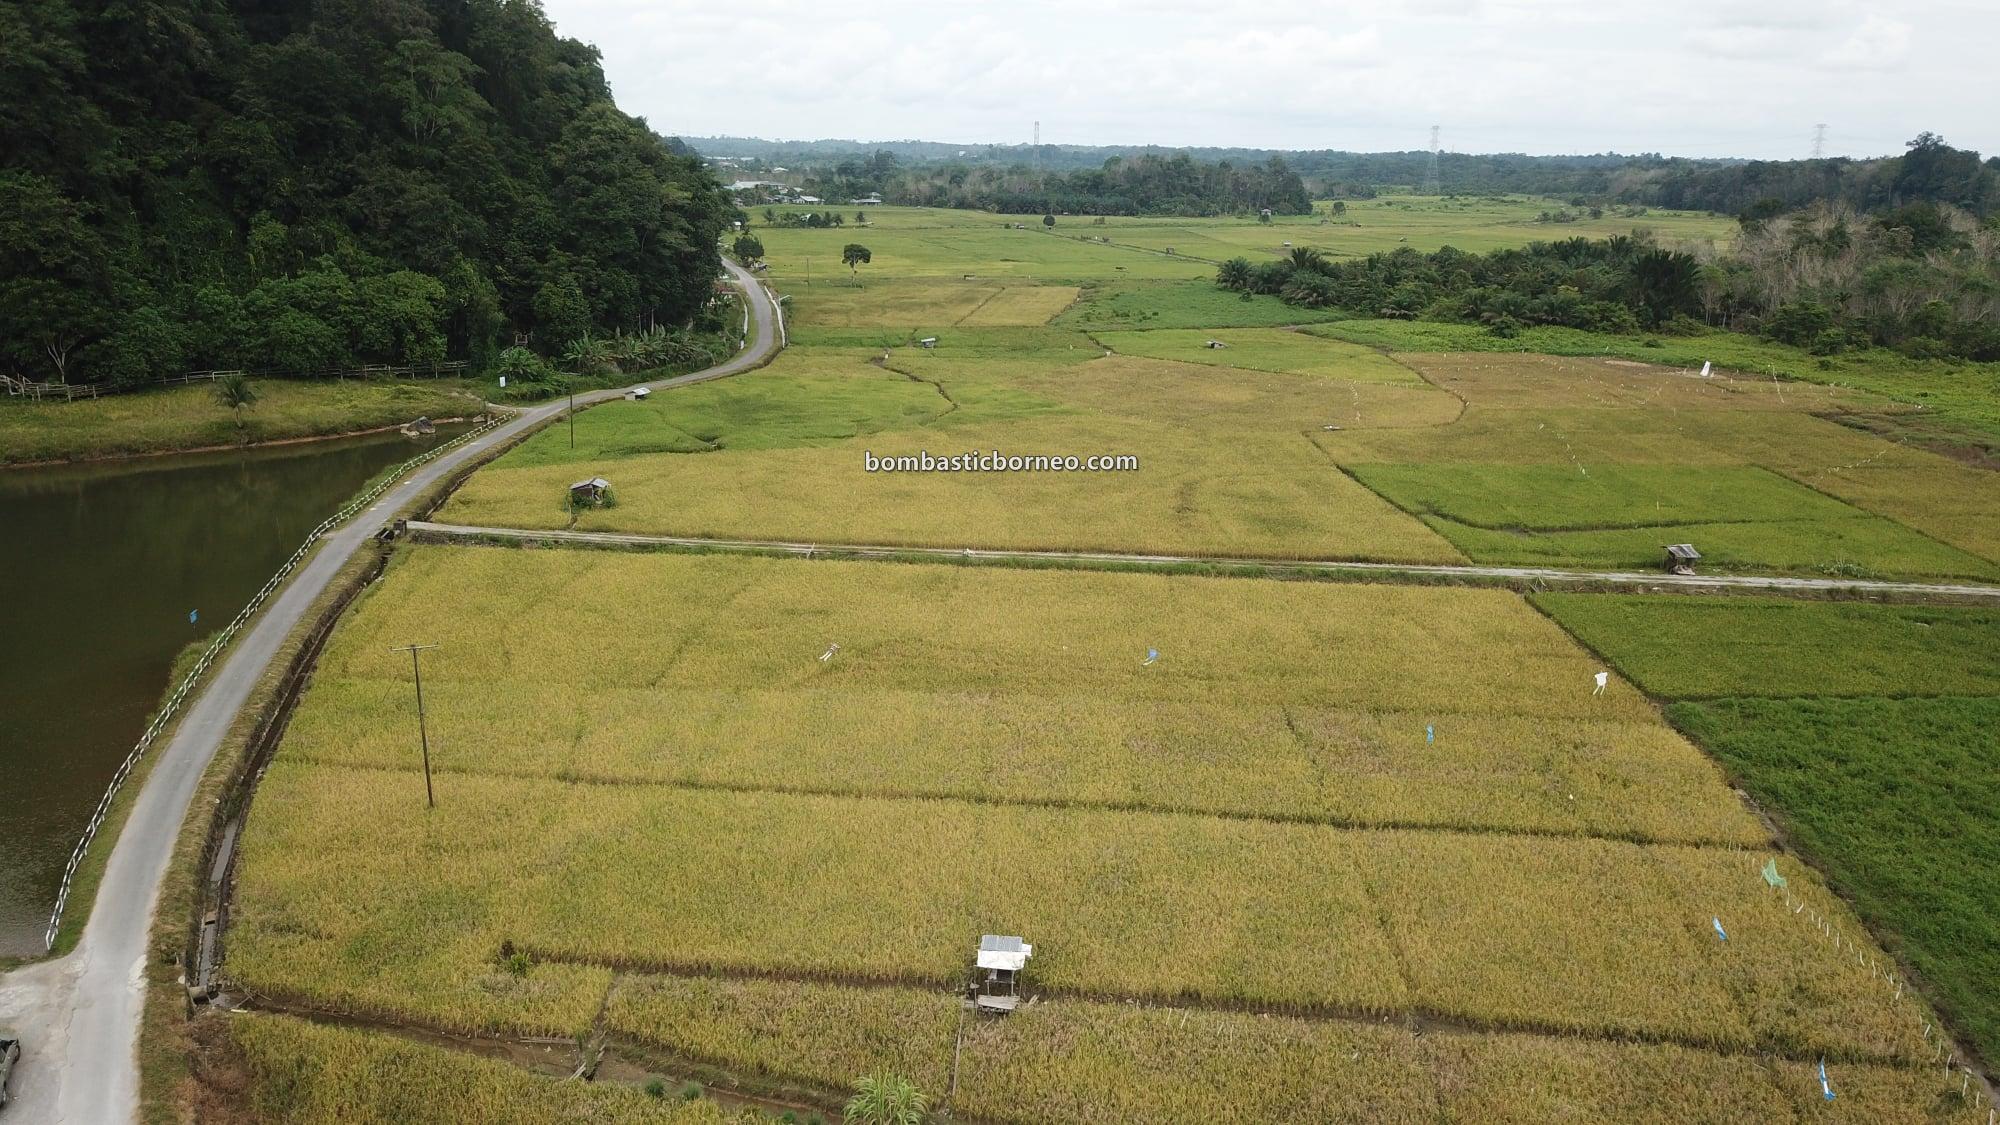 Sawah Padi, Kampung, Dayak Bidayuh, Serian, Malaysia, authentic, traditional, destination, objek wisata, ecotourism, travel local, Trans Borneo, 探索马来西亚砂拉越, 西连旅游景点, 婆罗洲稻米之乡